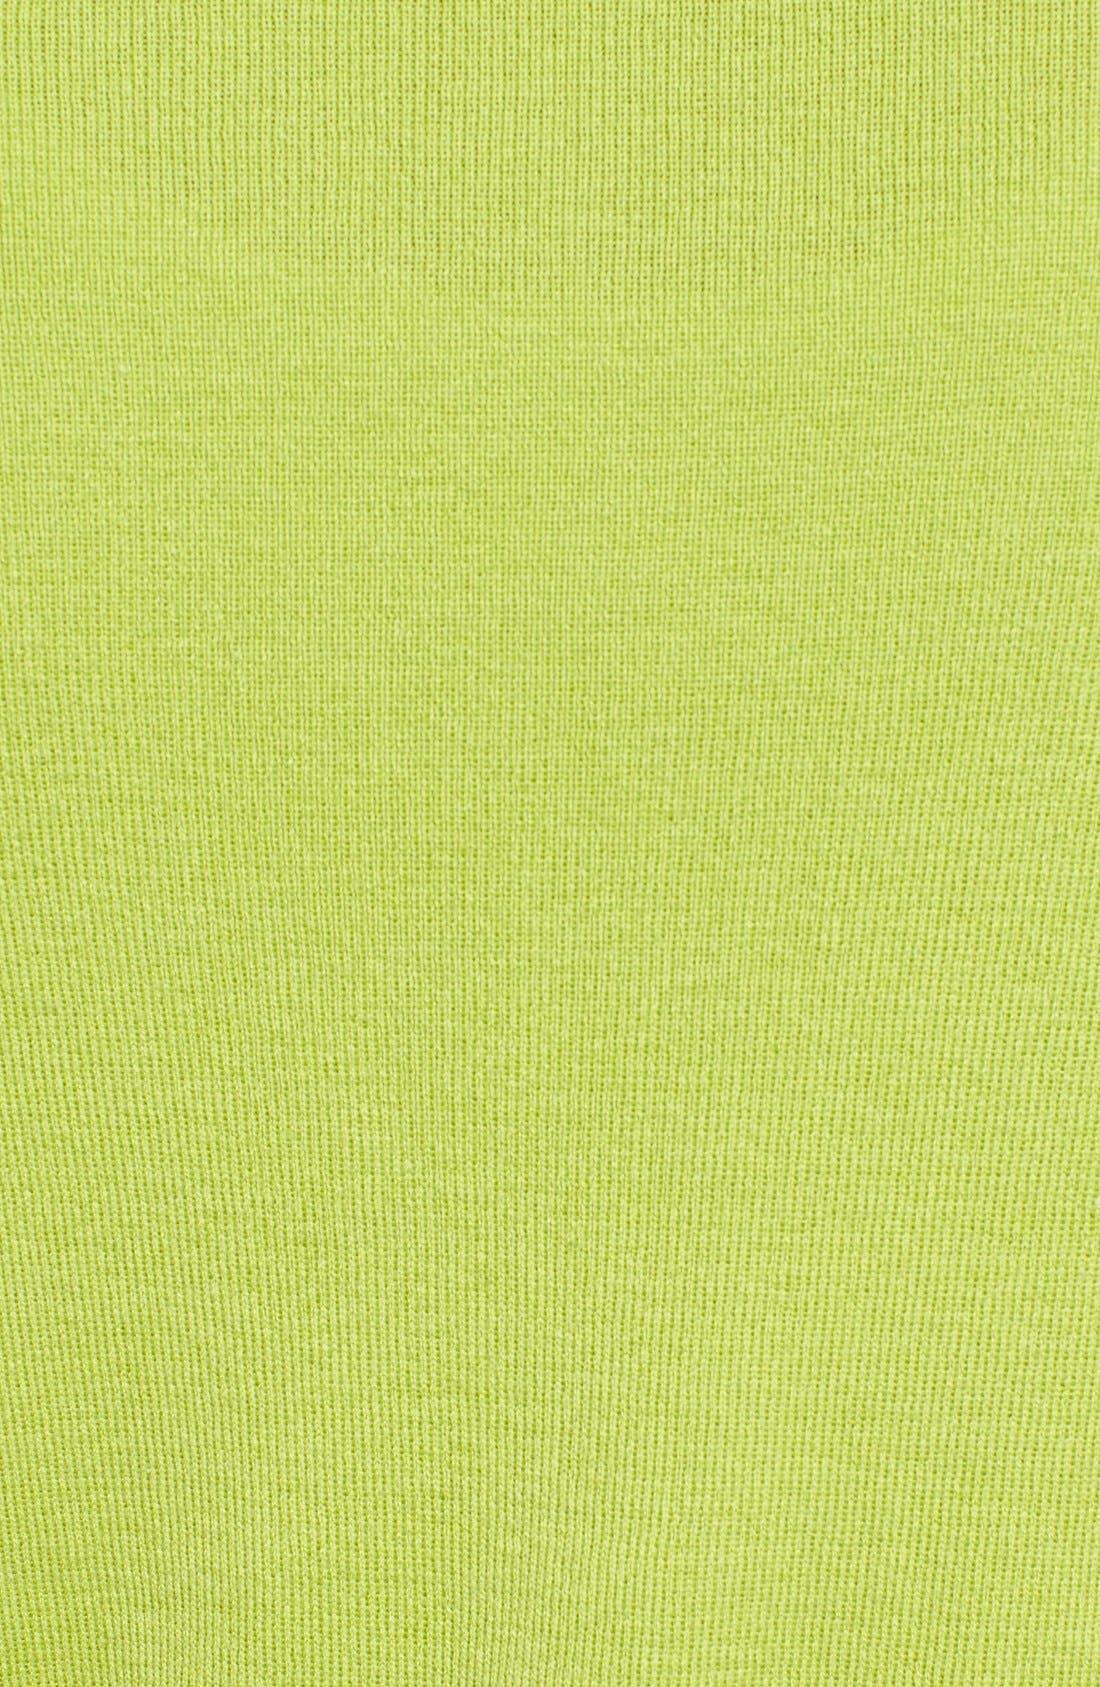 4-Way Convertible Lightweight Cardigan,                             Alternate thumbnail 119, color,